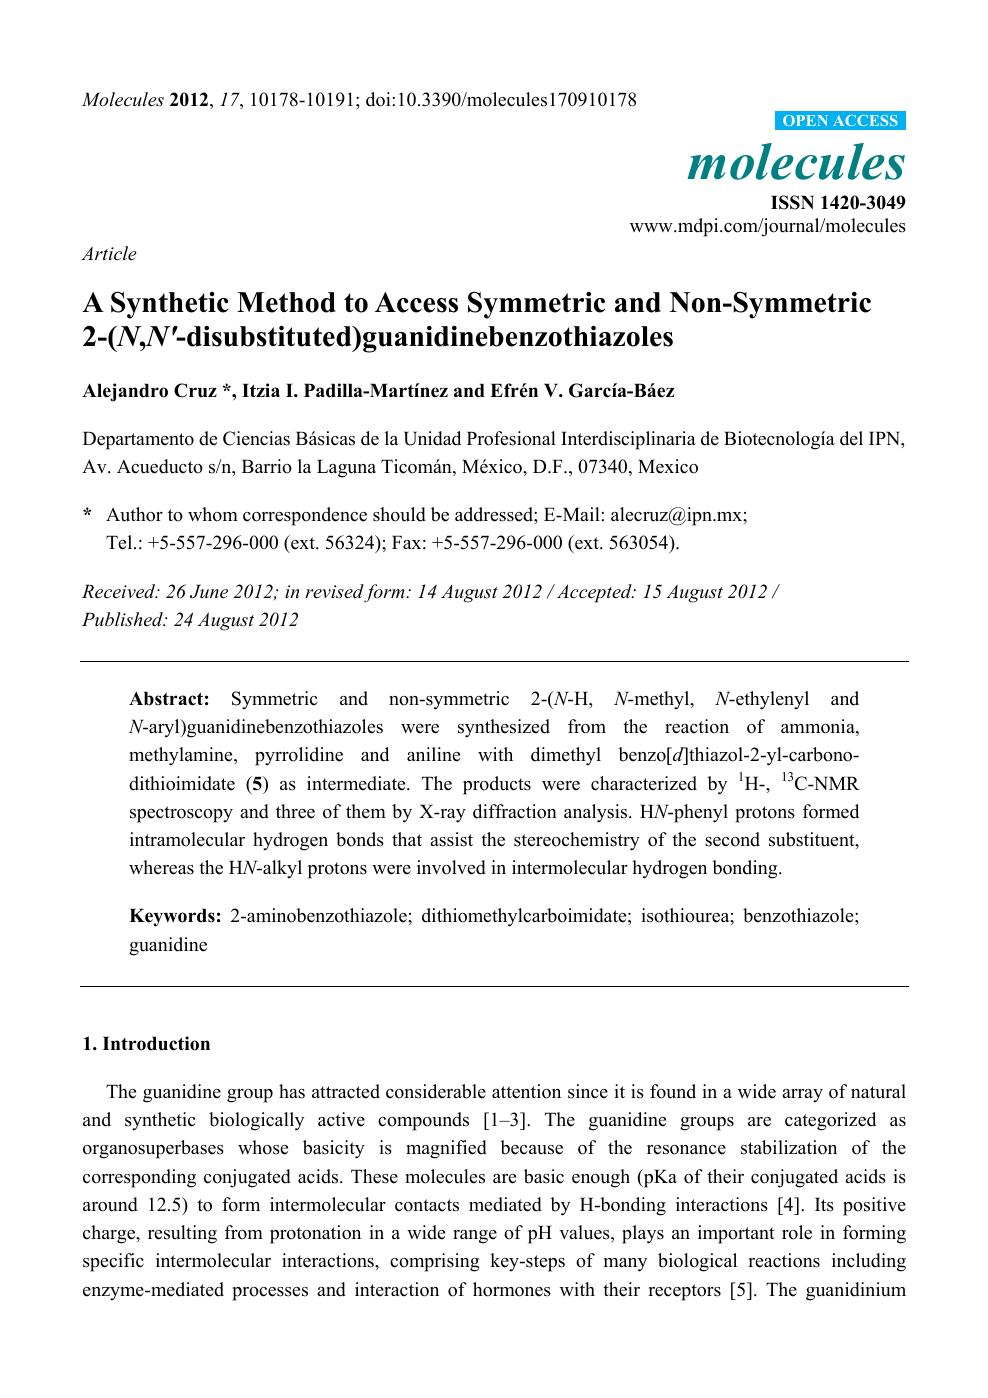 A Synthetic Method to Access Symmetric and Non-Symmetric 2